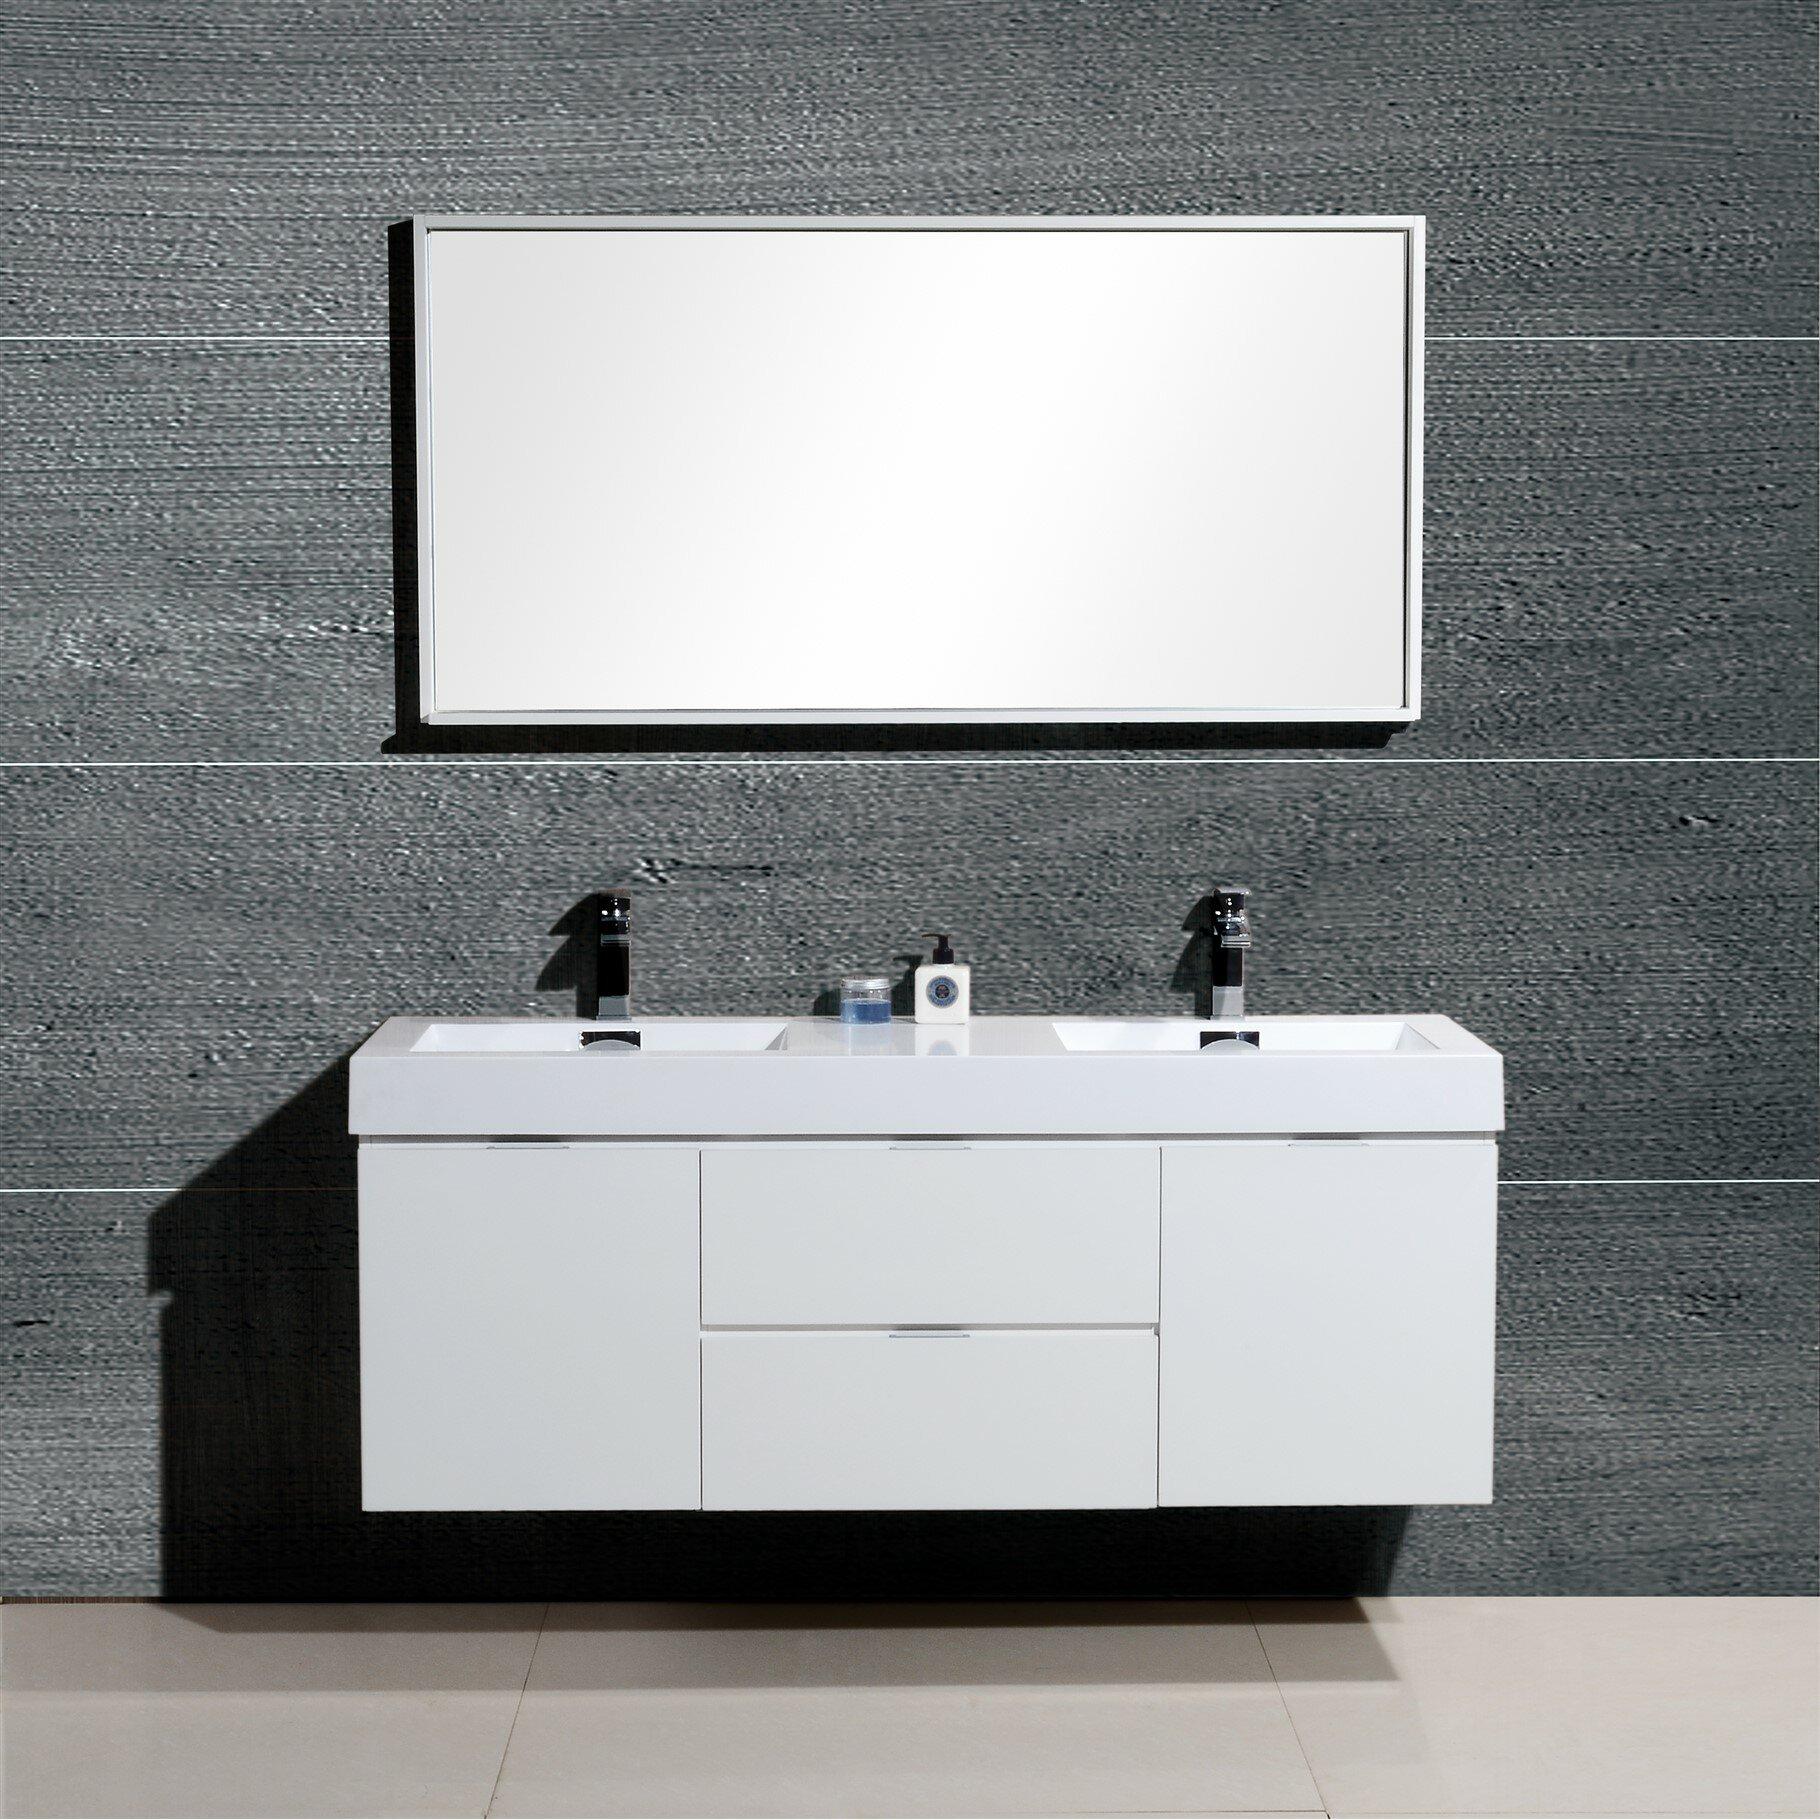 Kube bath bliss 60 double wall mount modern bathroom - Contemporary bathroom vanity sets ...